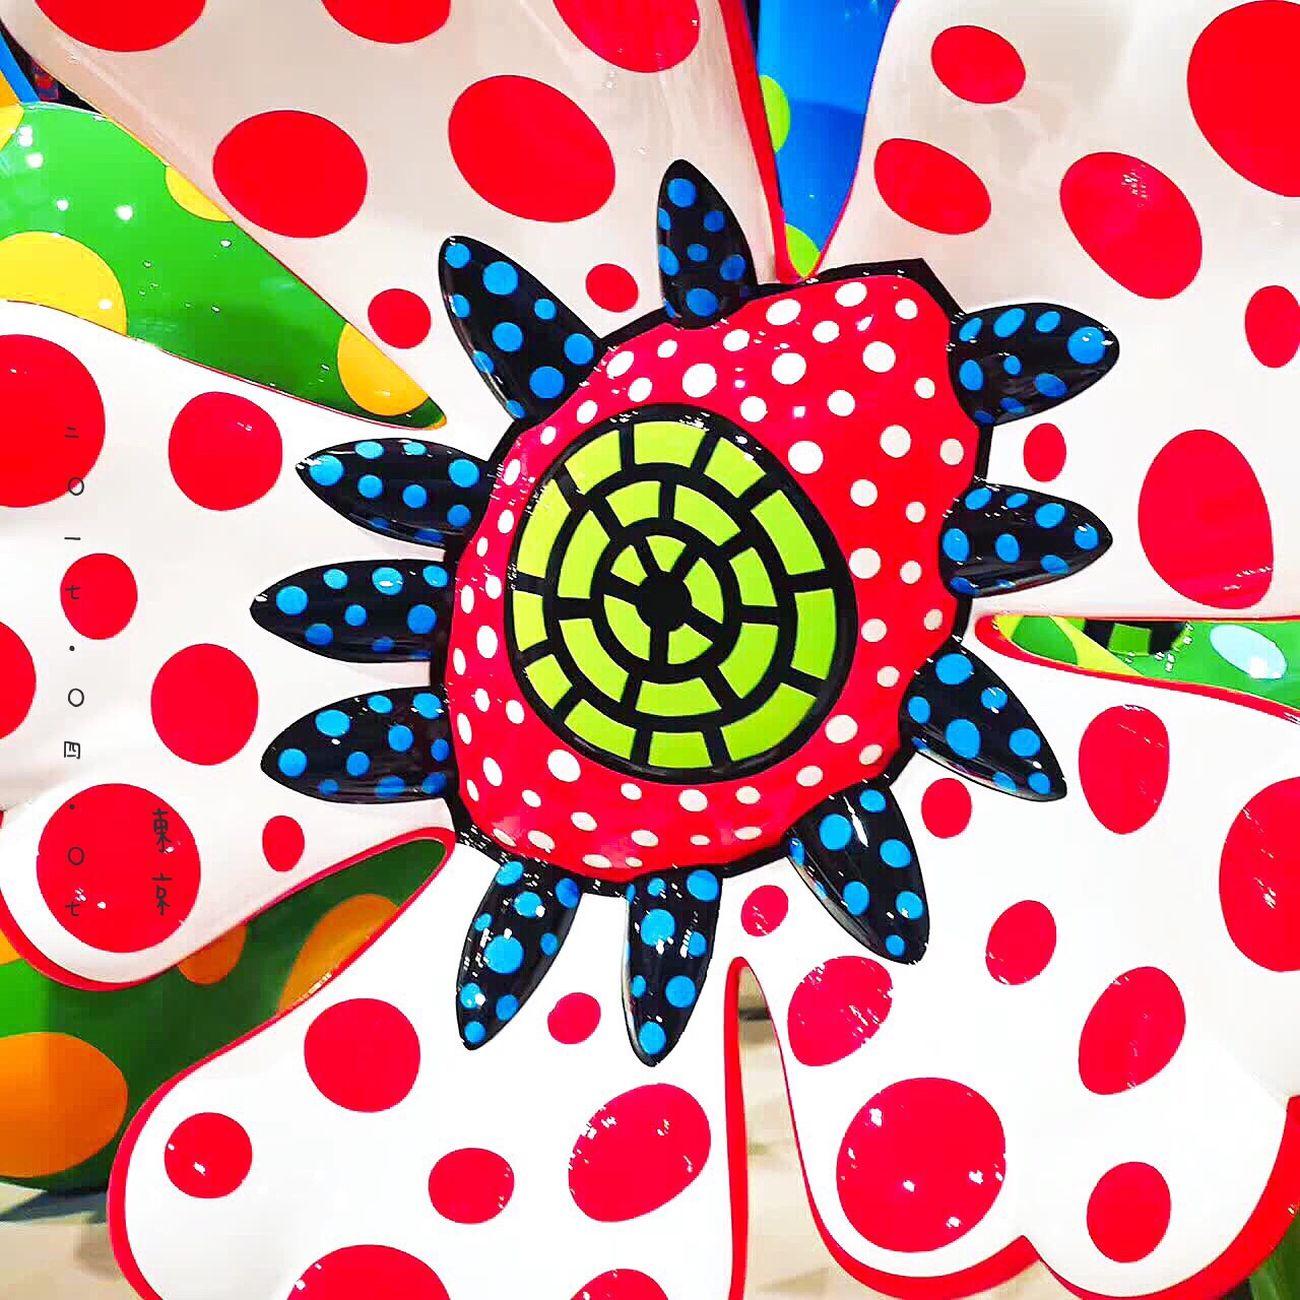 永遠的草間彌生,波點女王回顧大展。辣眼睛,辣眼睛,還是辣眼睛,從初到現在作品幾乎全收錄,沒有看過再全的了。 Beautiful Enjoying Life First Eyeem Photo Photography Hello World Travel THE NATIONAL ART CENTER,TOKYO Tokyo Japan Yayoi Kusama 草間彌生 Art Museum